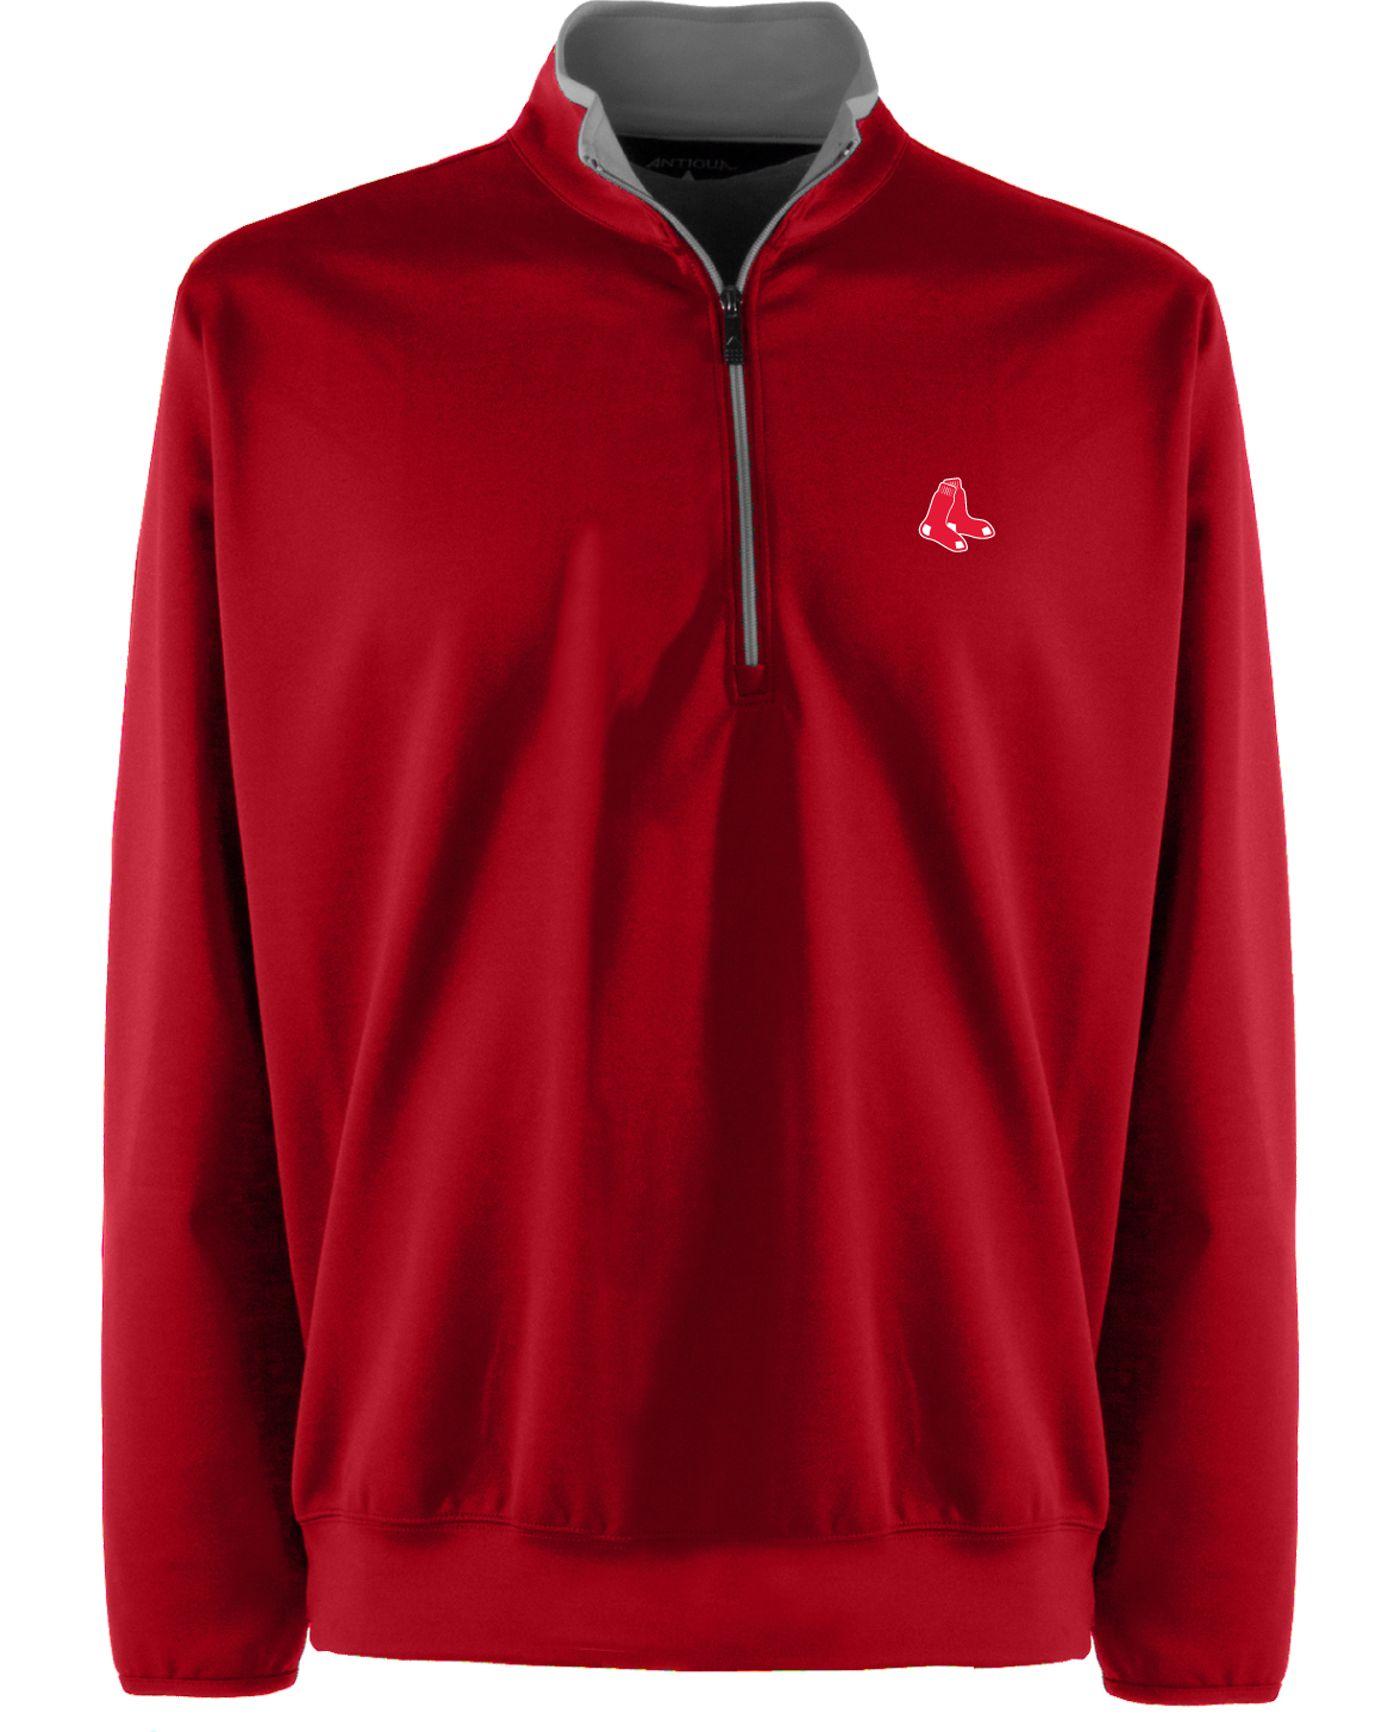 Antigua Men's Boston Red Sox Leader Red Quarter-Zip Pullover